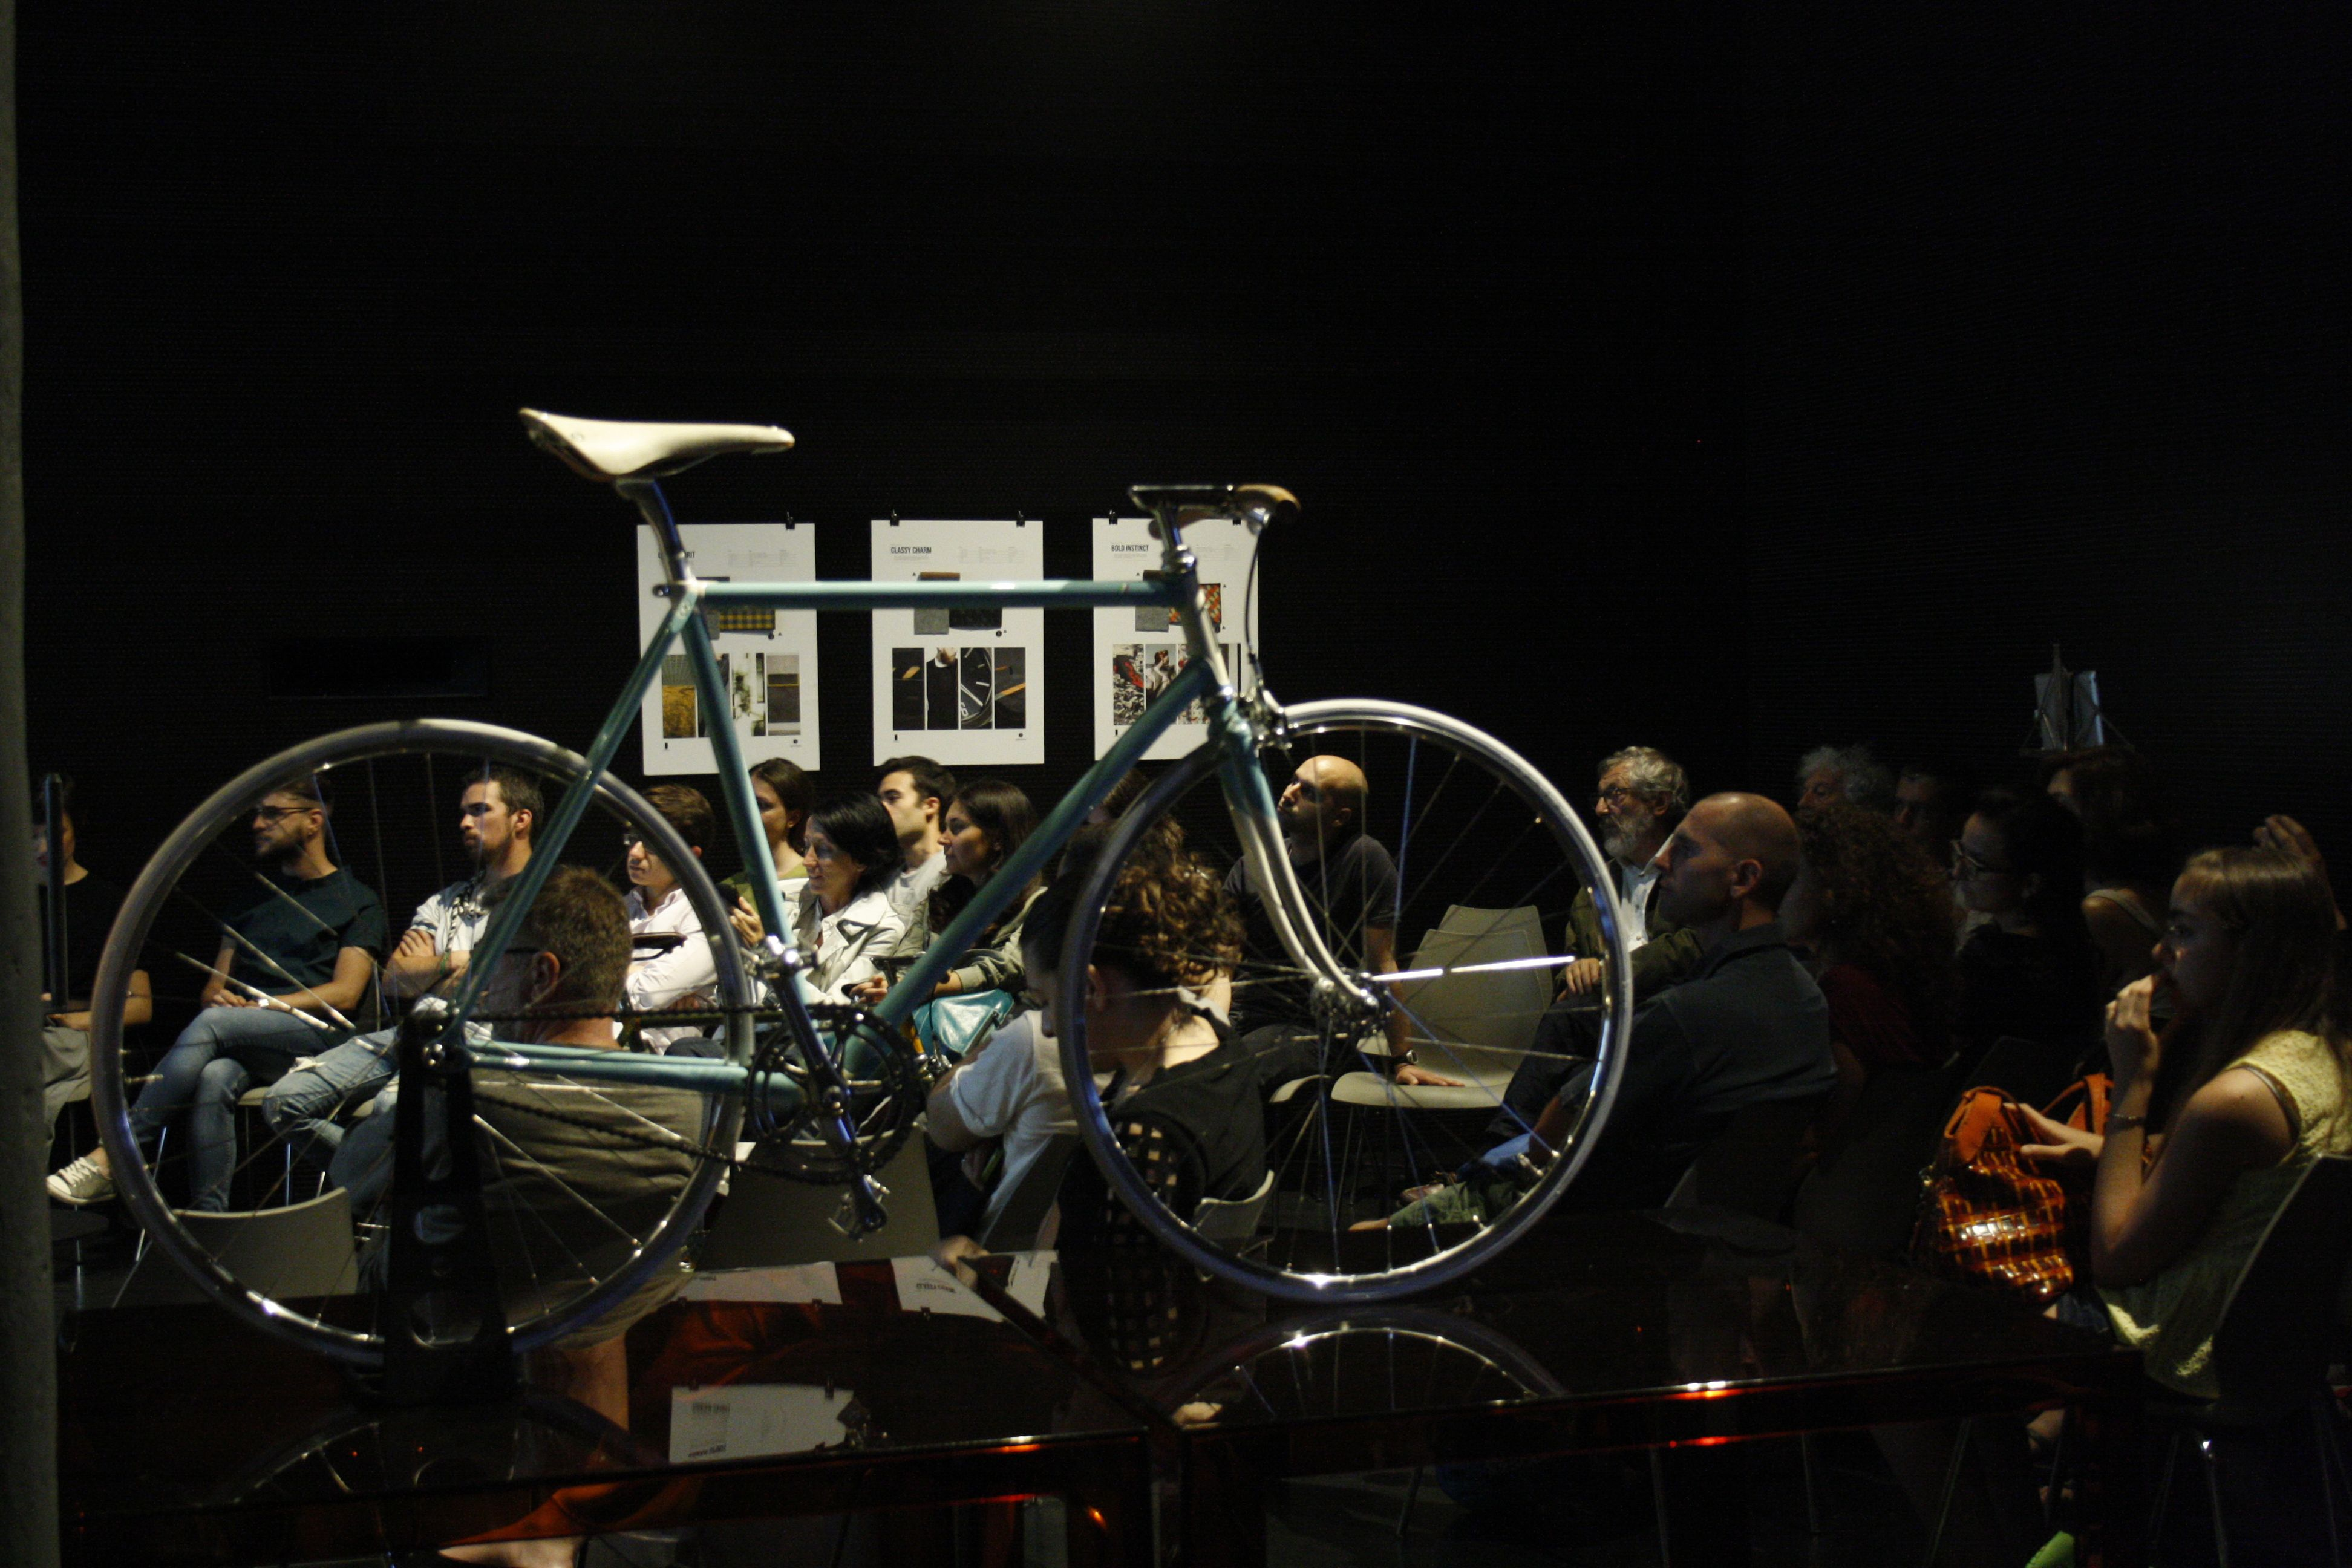 Bicicletta - Bike Scatto Italiano ©2014 DesignLibrary - photo: Francesca Viganò #bike #cycle# bicycle #fixie #fixed #fixedgear #steel #handmade #customized #madeinitaly